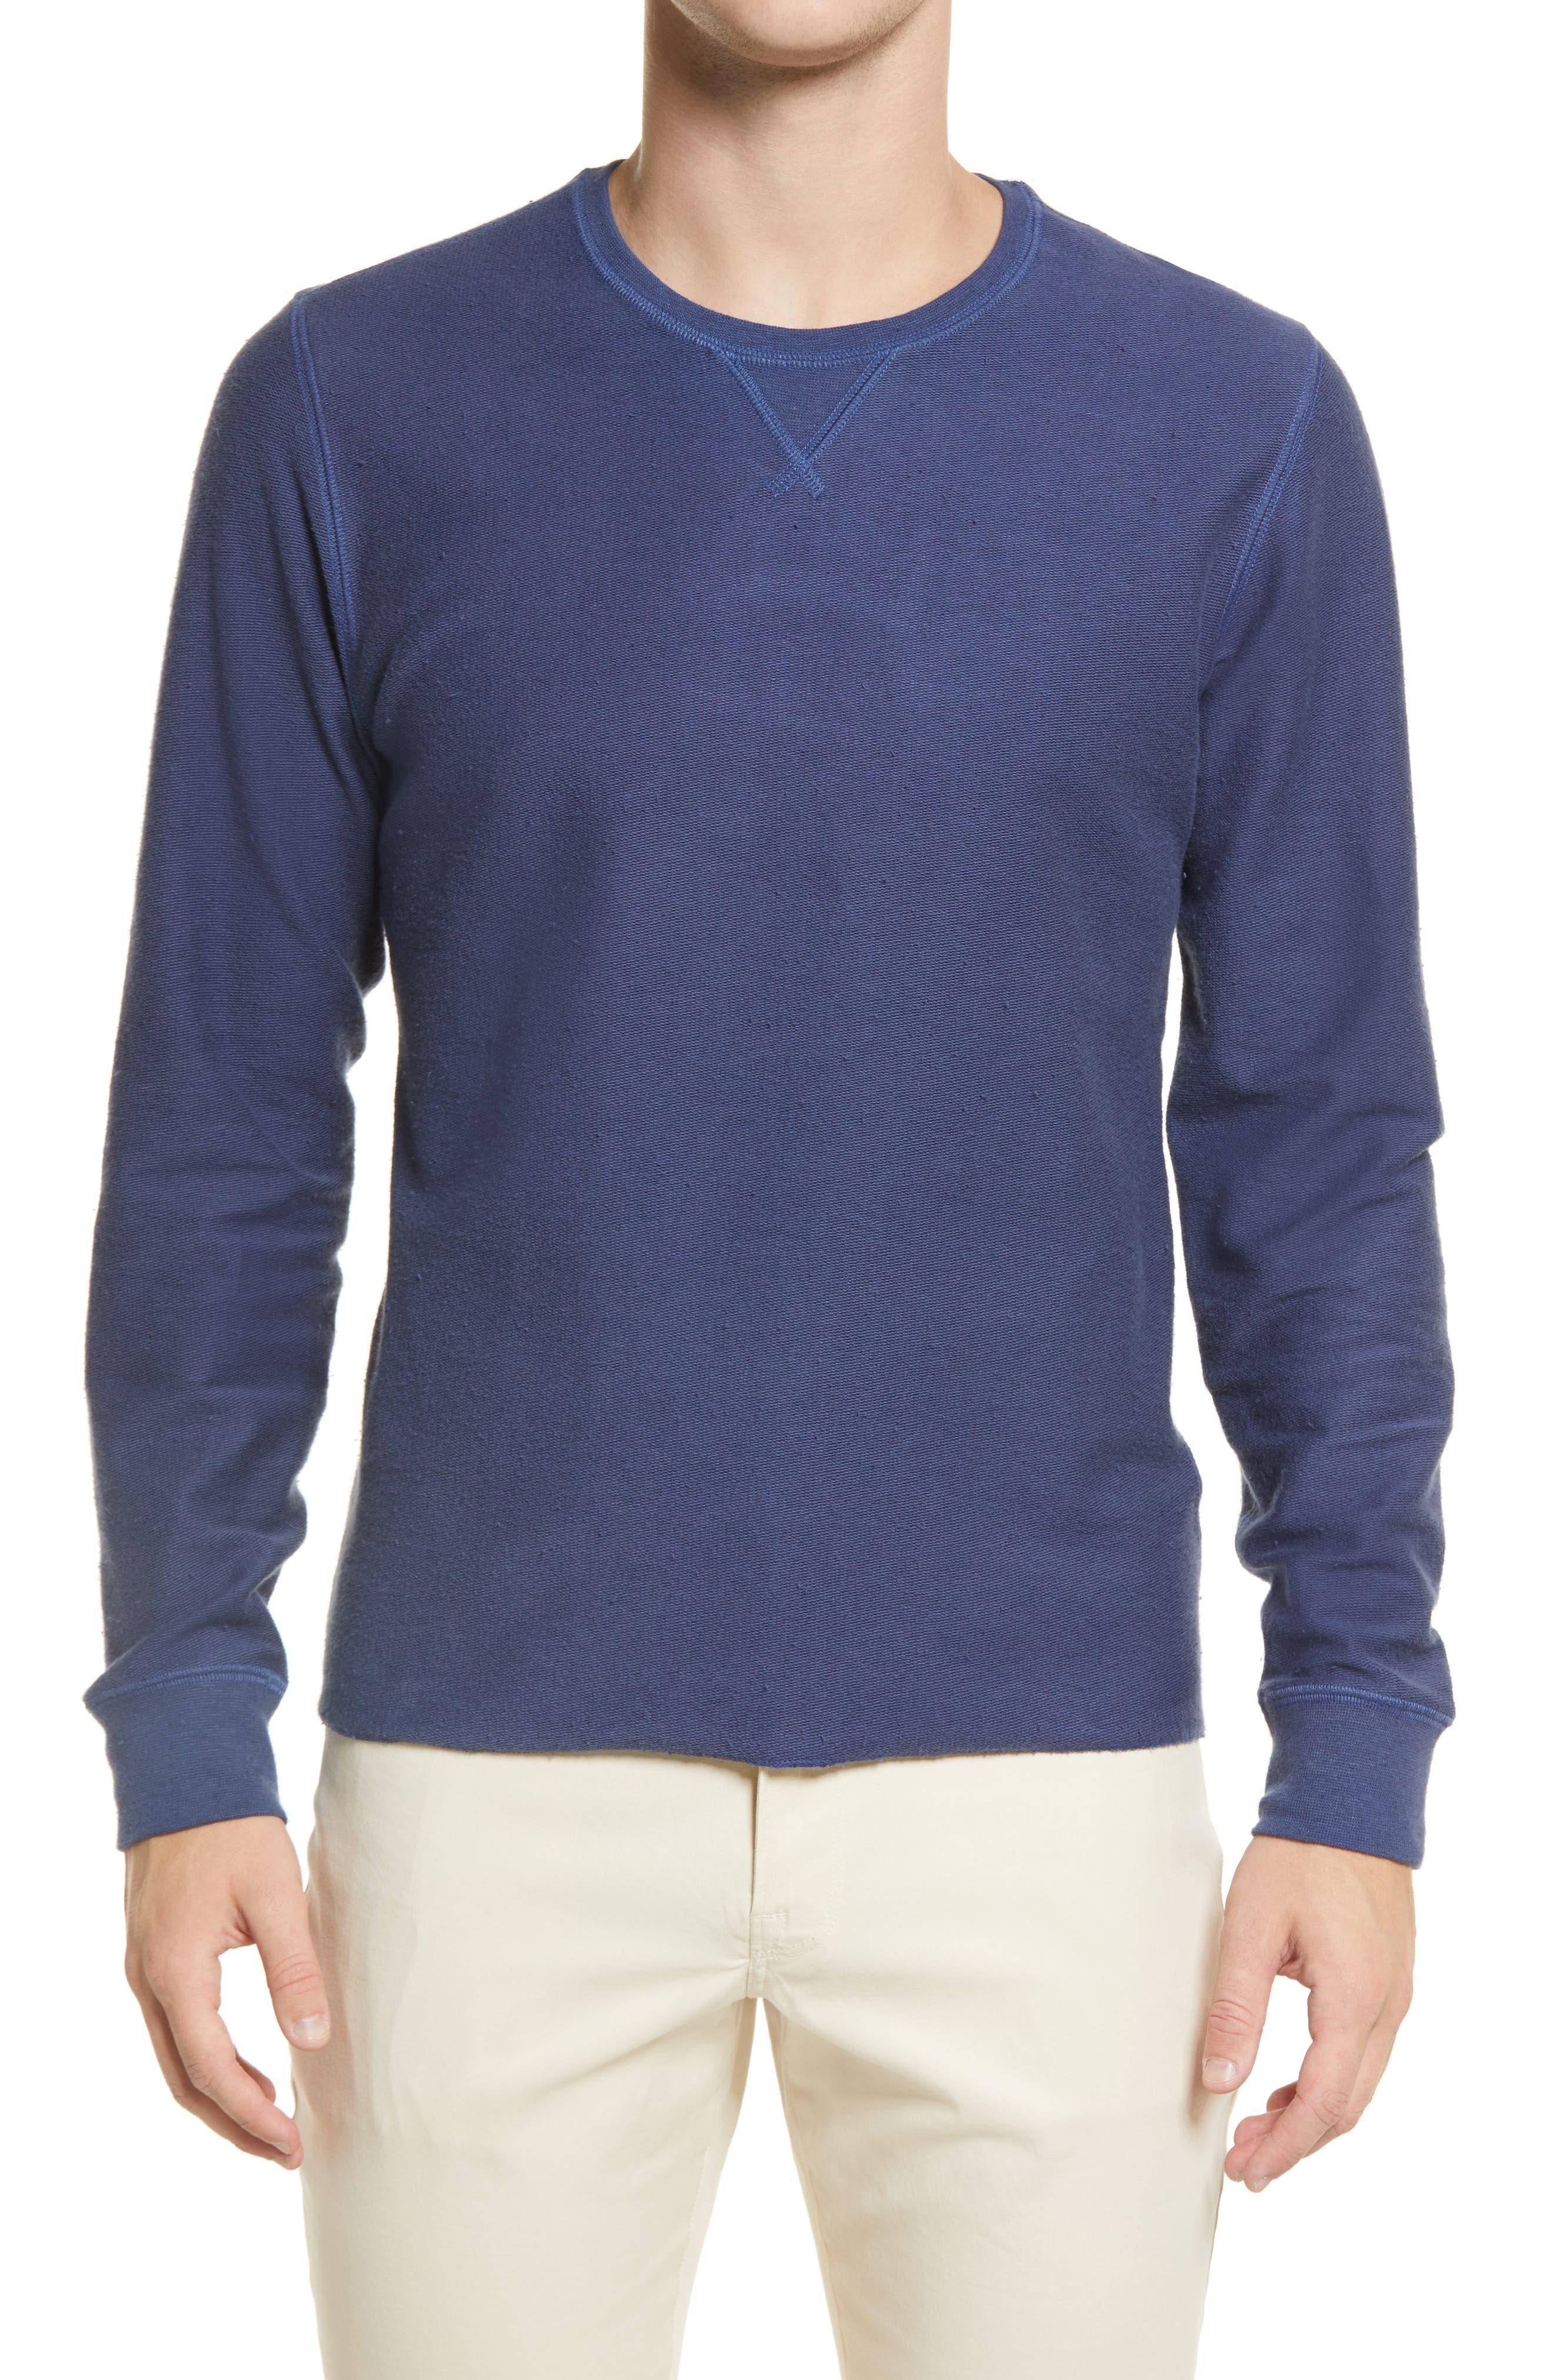 Cotton & Linen Sweatshirt